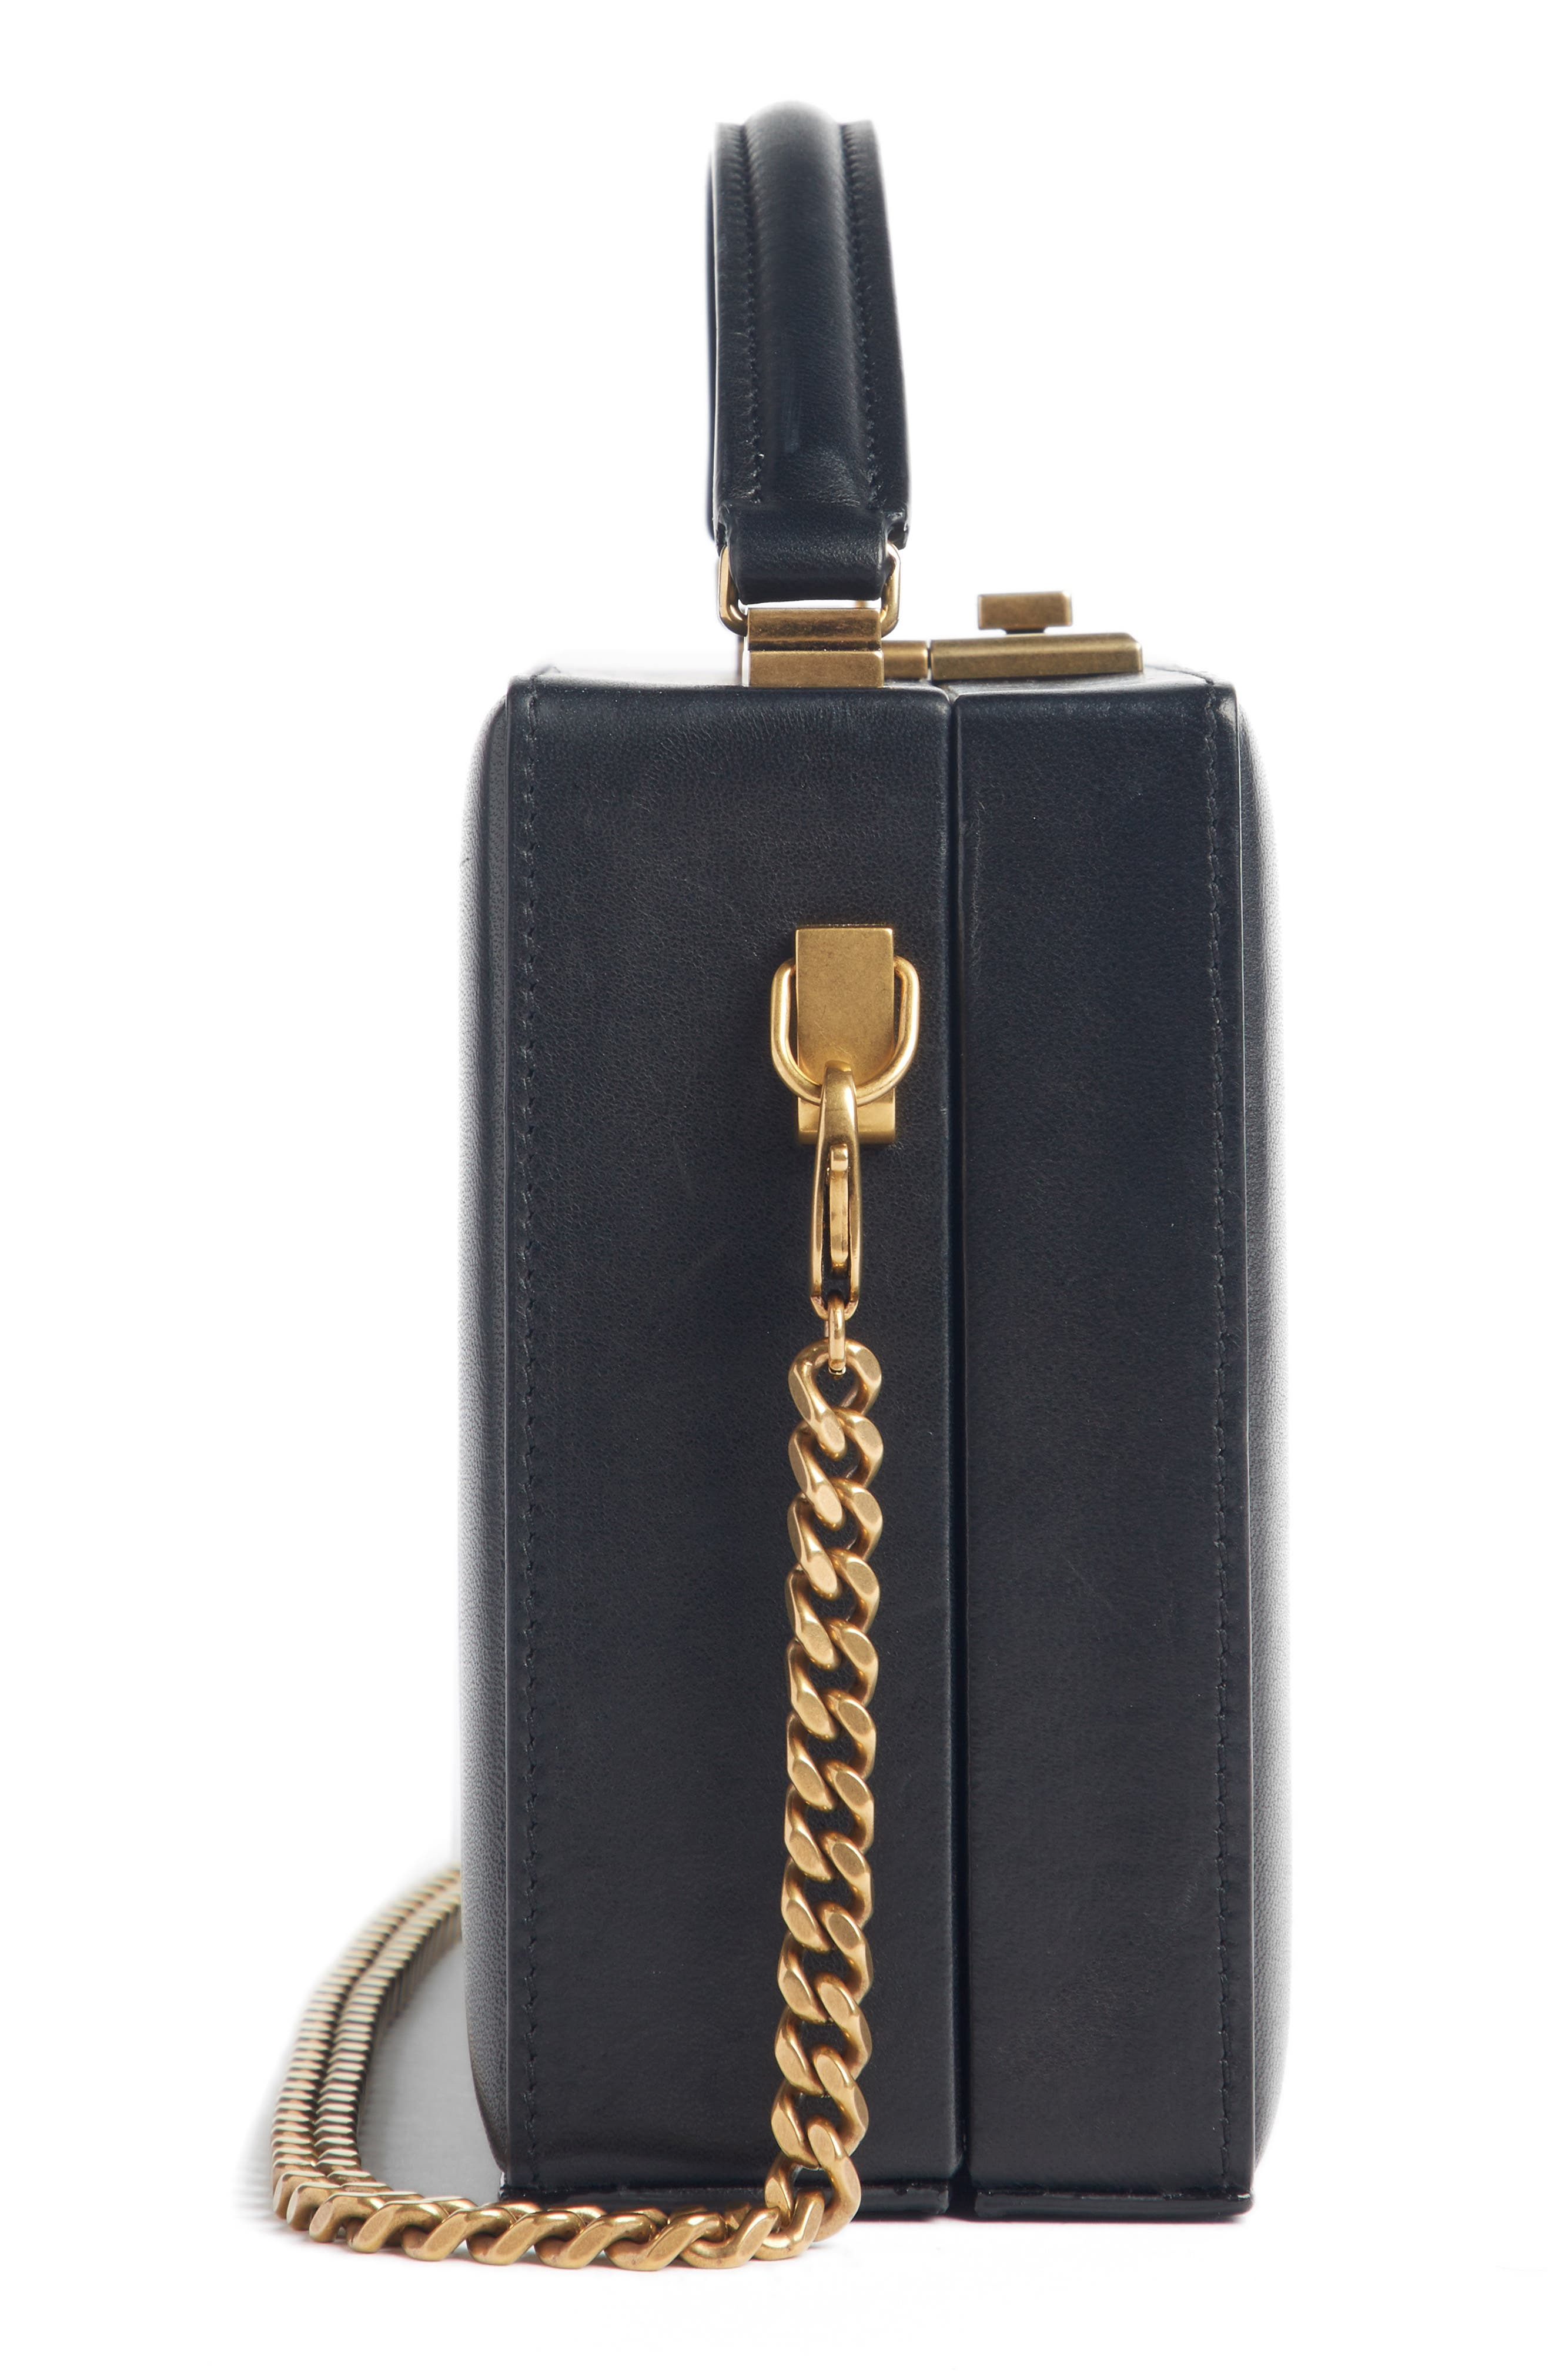 Nan Quilted Leather Frame Bag,                             Alternate thumbnail 3, color,                             NOIR